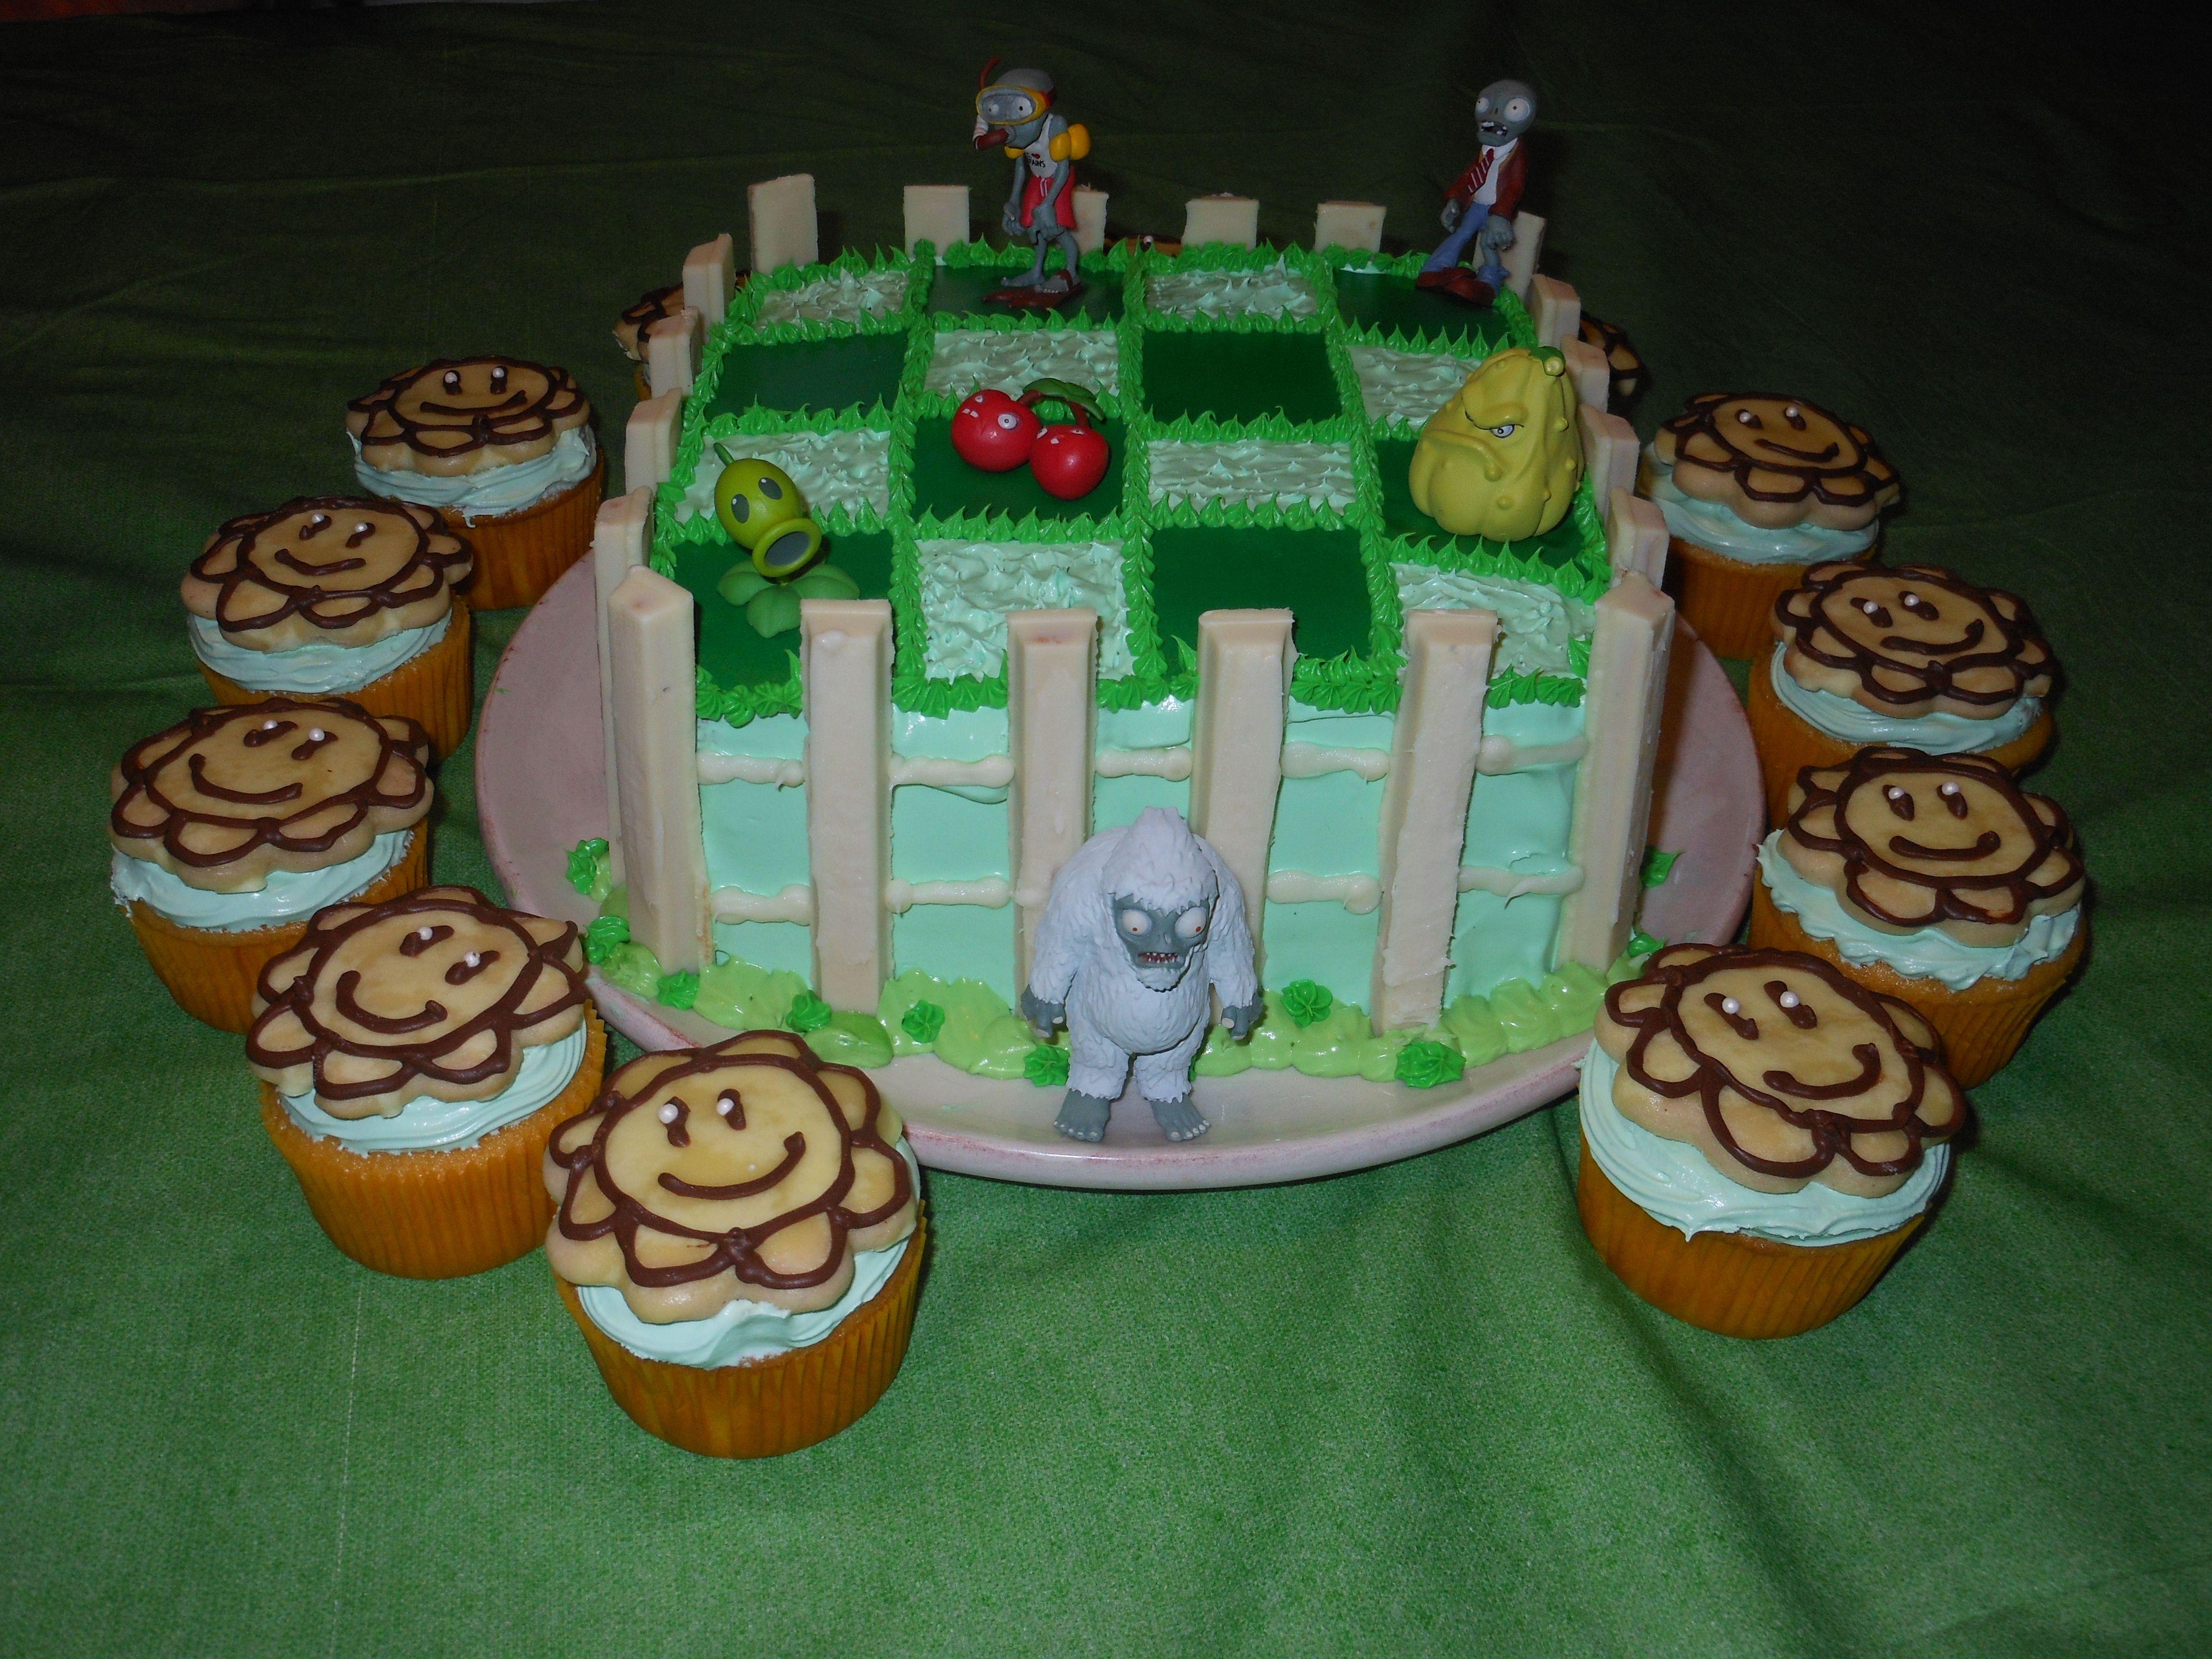 Plants Vs. Zombie Cake I made for my nephews 11th Birthday!